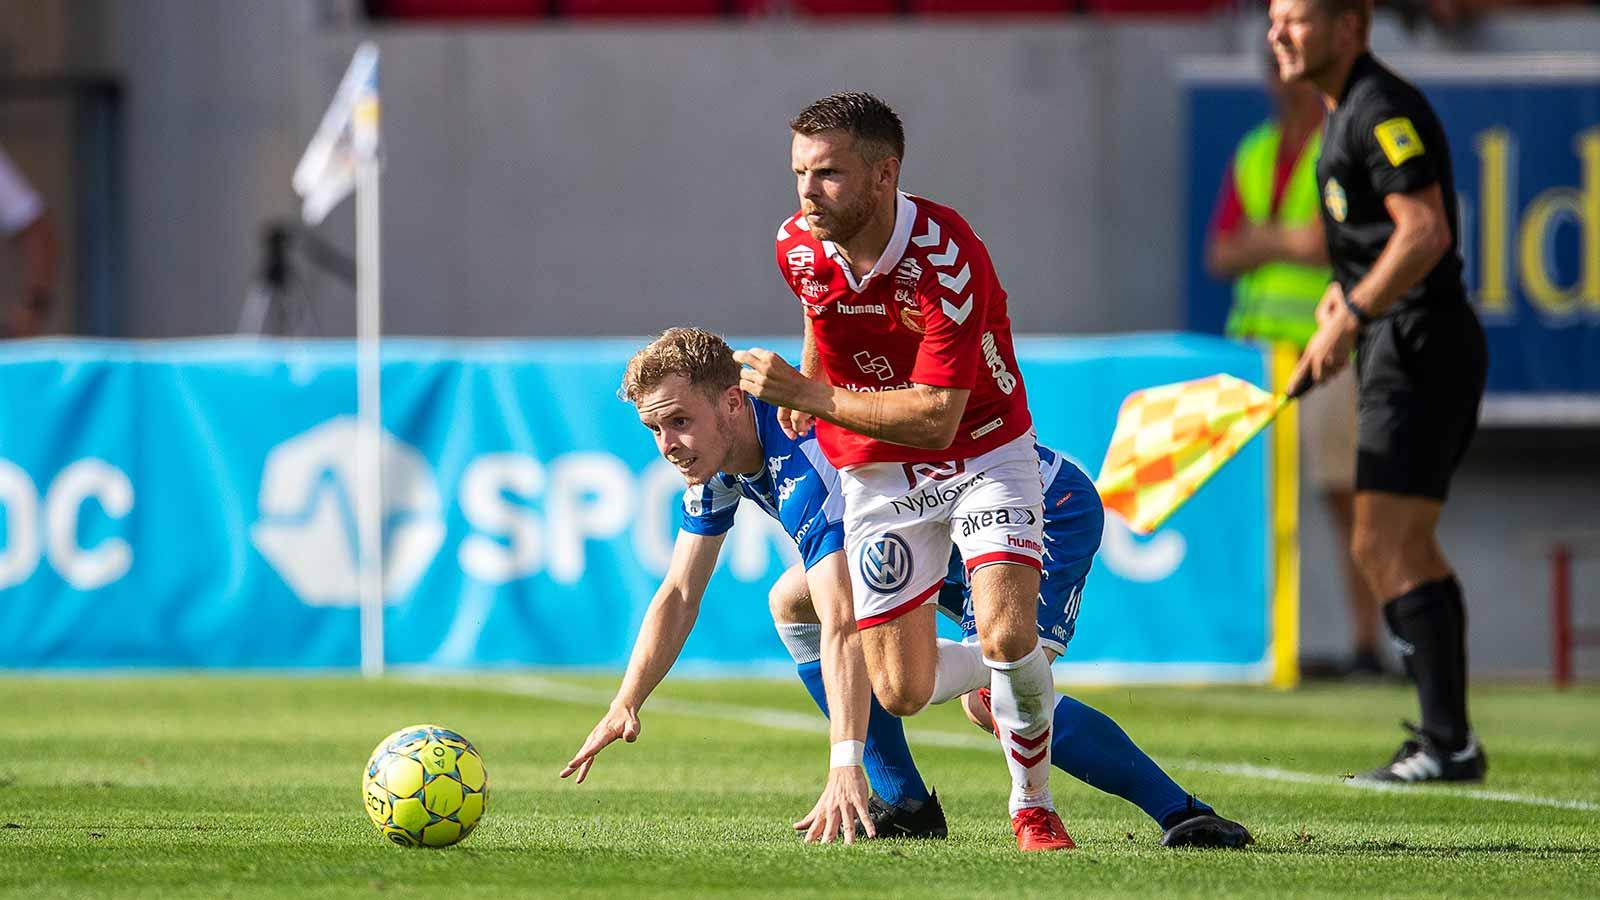 180804 Kalmars Måns Söderqvist och IFK Göteborgs Victor Wernersson under fotbollsmatchen i Allsvenskan mellan Kalmar och IFK Göteborg den 4 augusti 2018 i Kalmar.